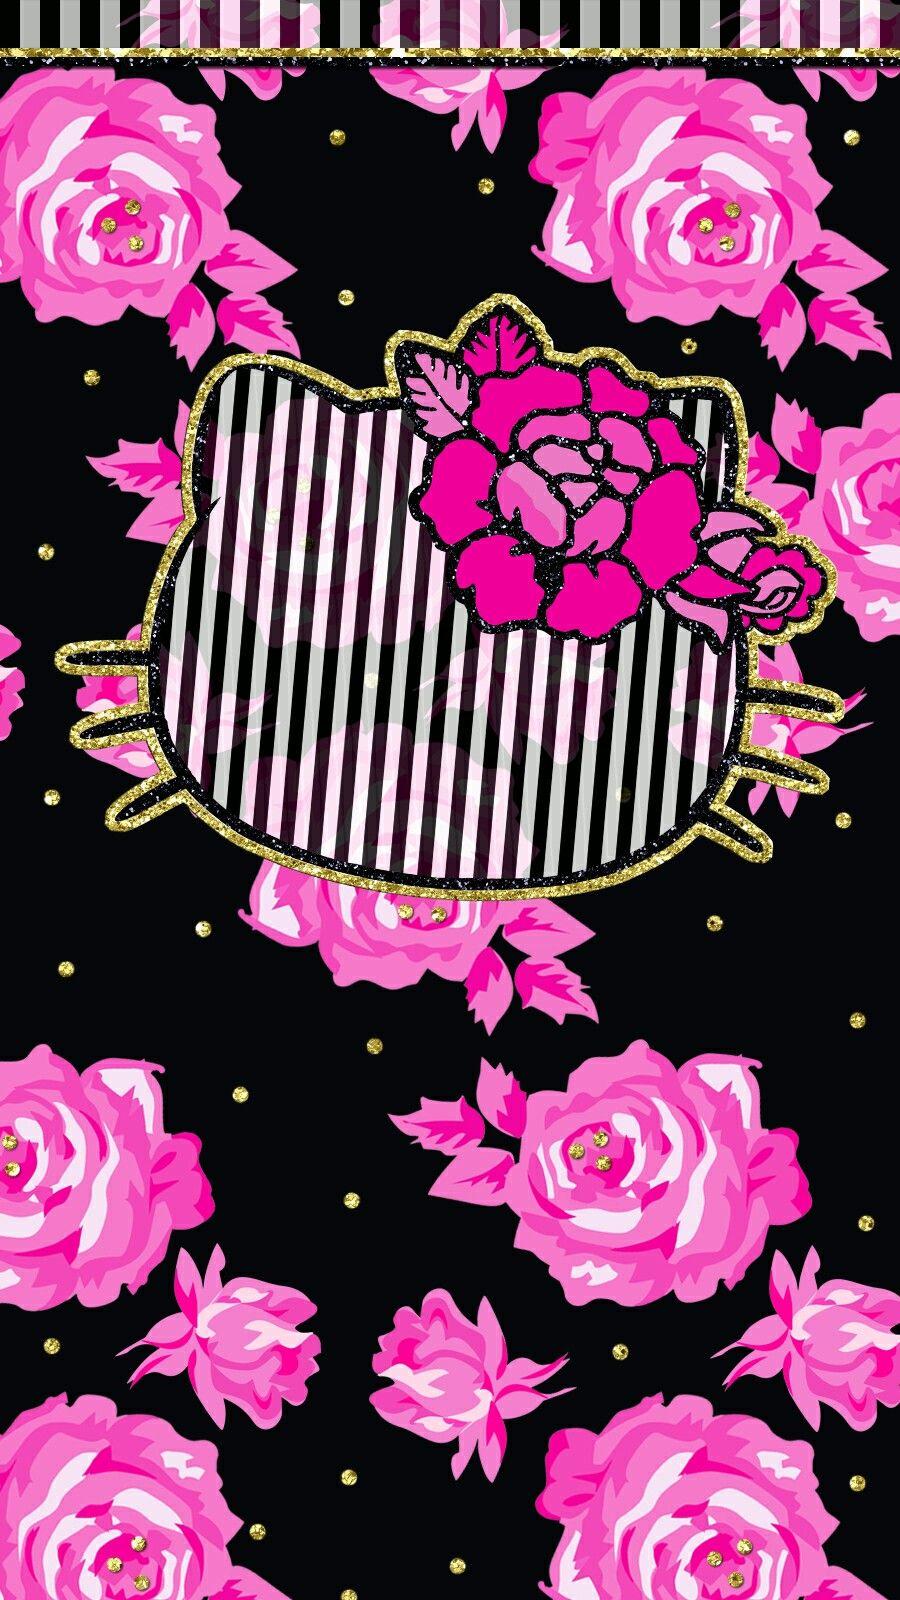 Download Wallpaper Hello Kitty Iphone 4 - 065875085e4bd95b30835ce13574f93a  Graphic_525963.jpg